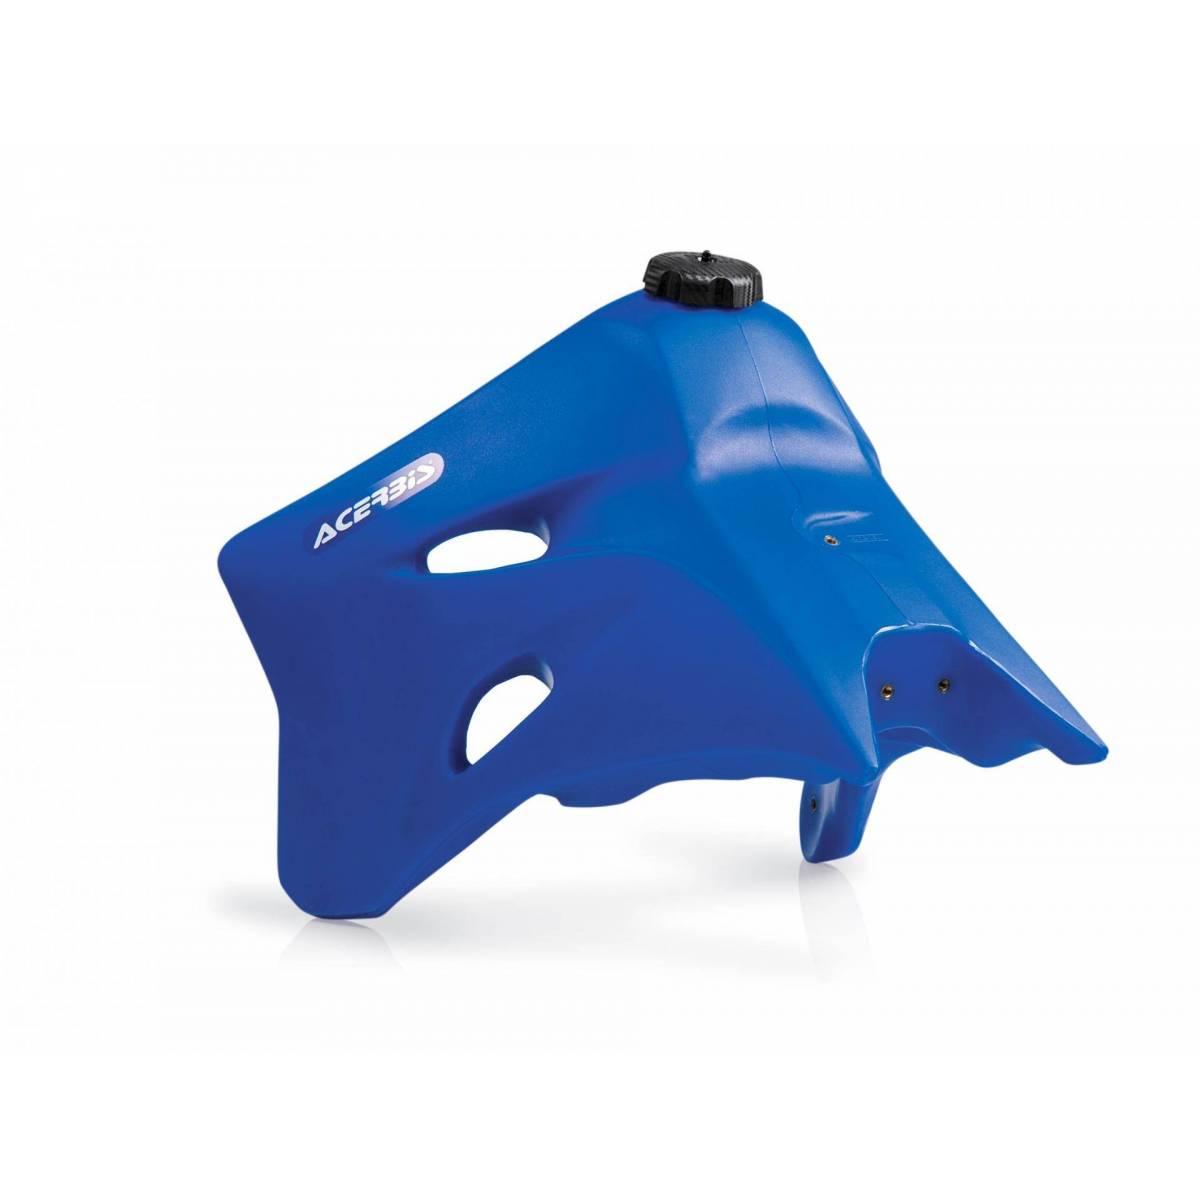 0010930-040 - Deposito Acerbis Yamaha Yzf Wrf 250 450 06 09 12.5 Litros Azul